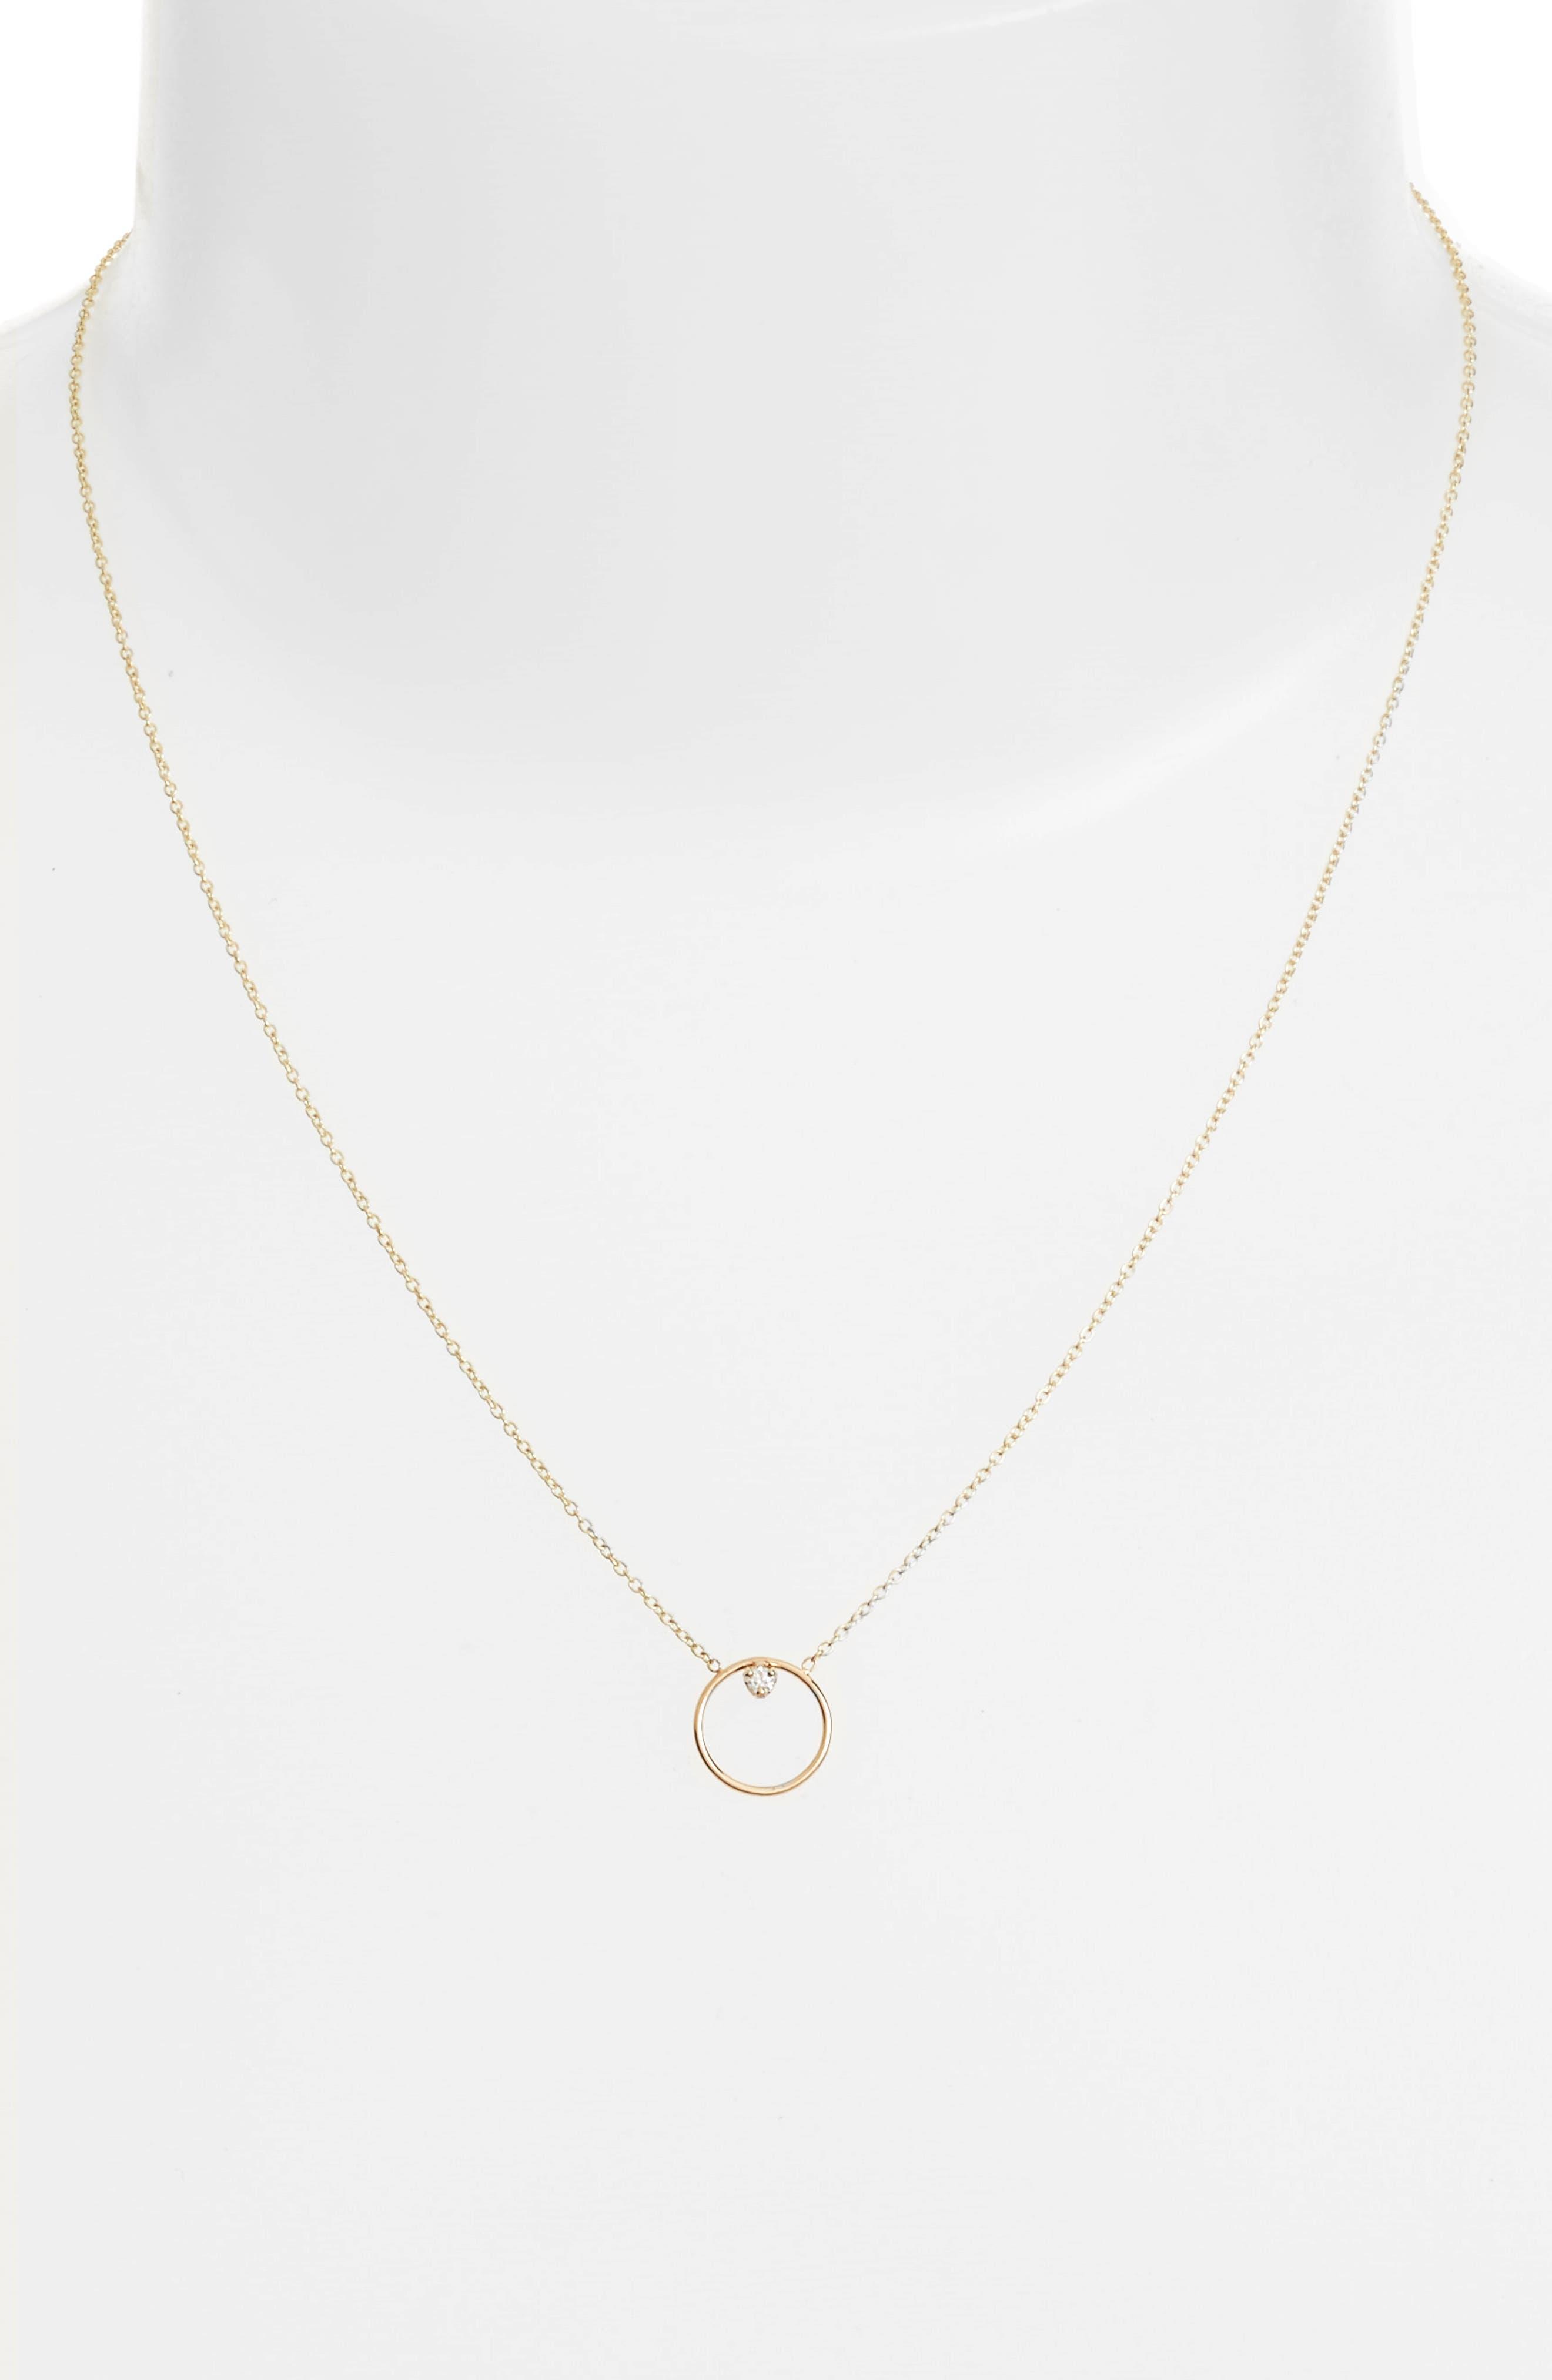 Zoe Chicco Diamond Circle Necklace